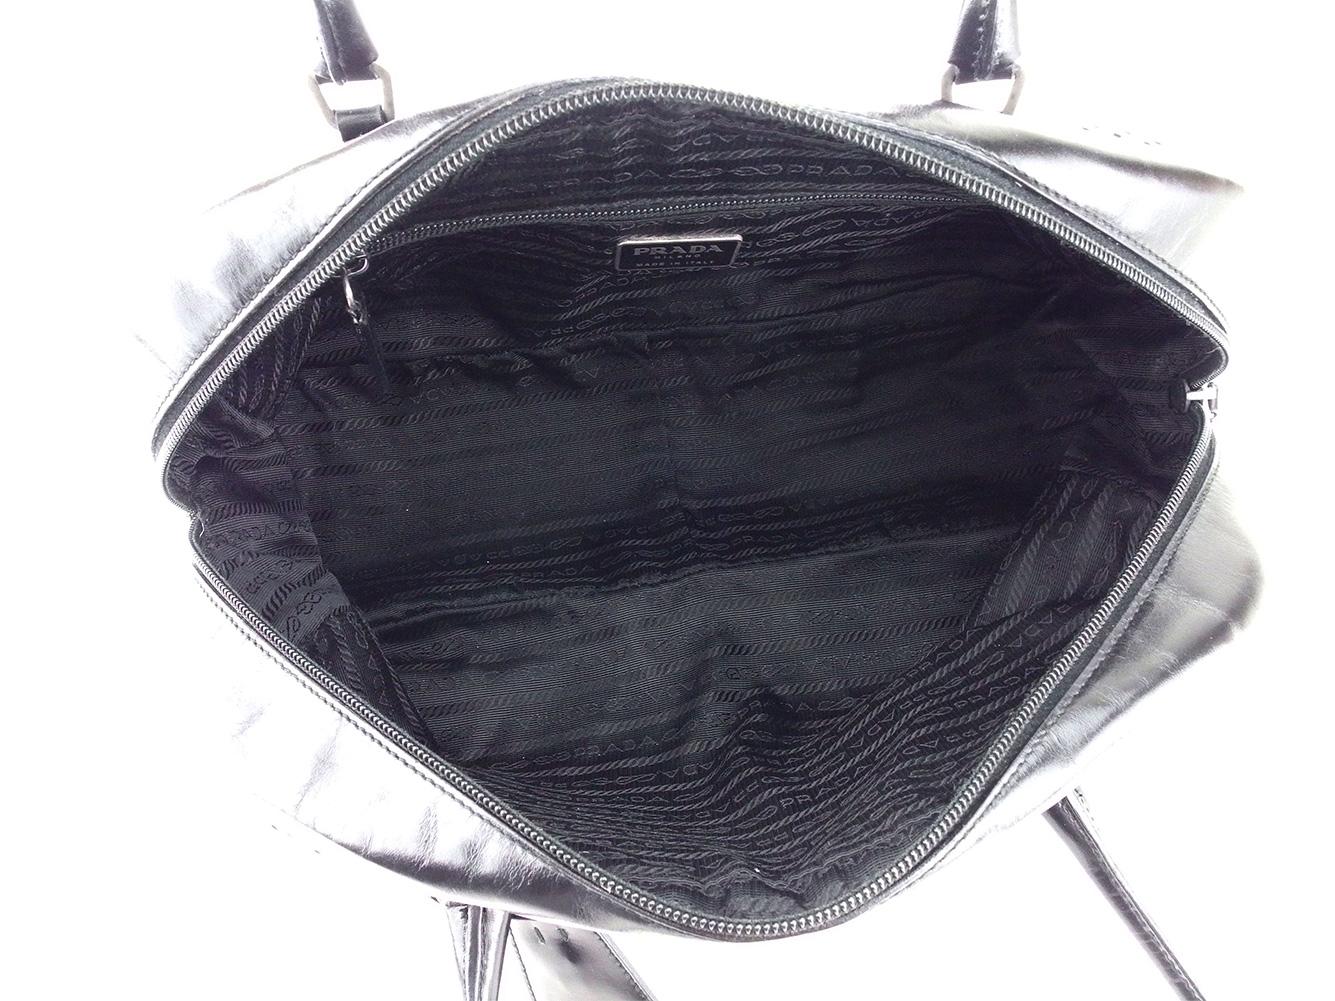 Prada PRADA handbag bowling bag bag lady men punching black silver system leather  popularity sale L2547 ec31c6a791d44